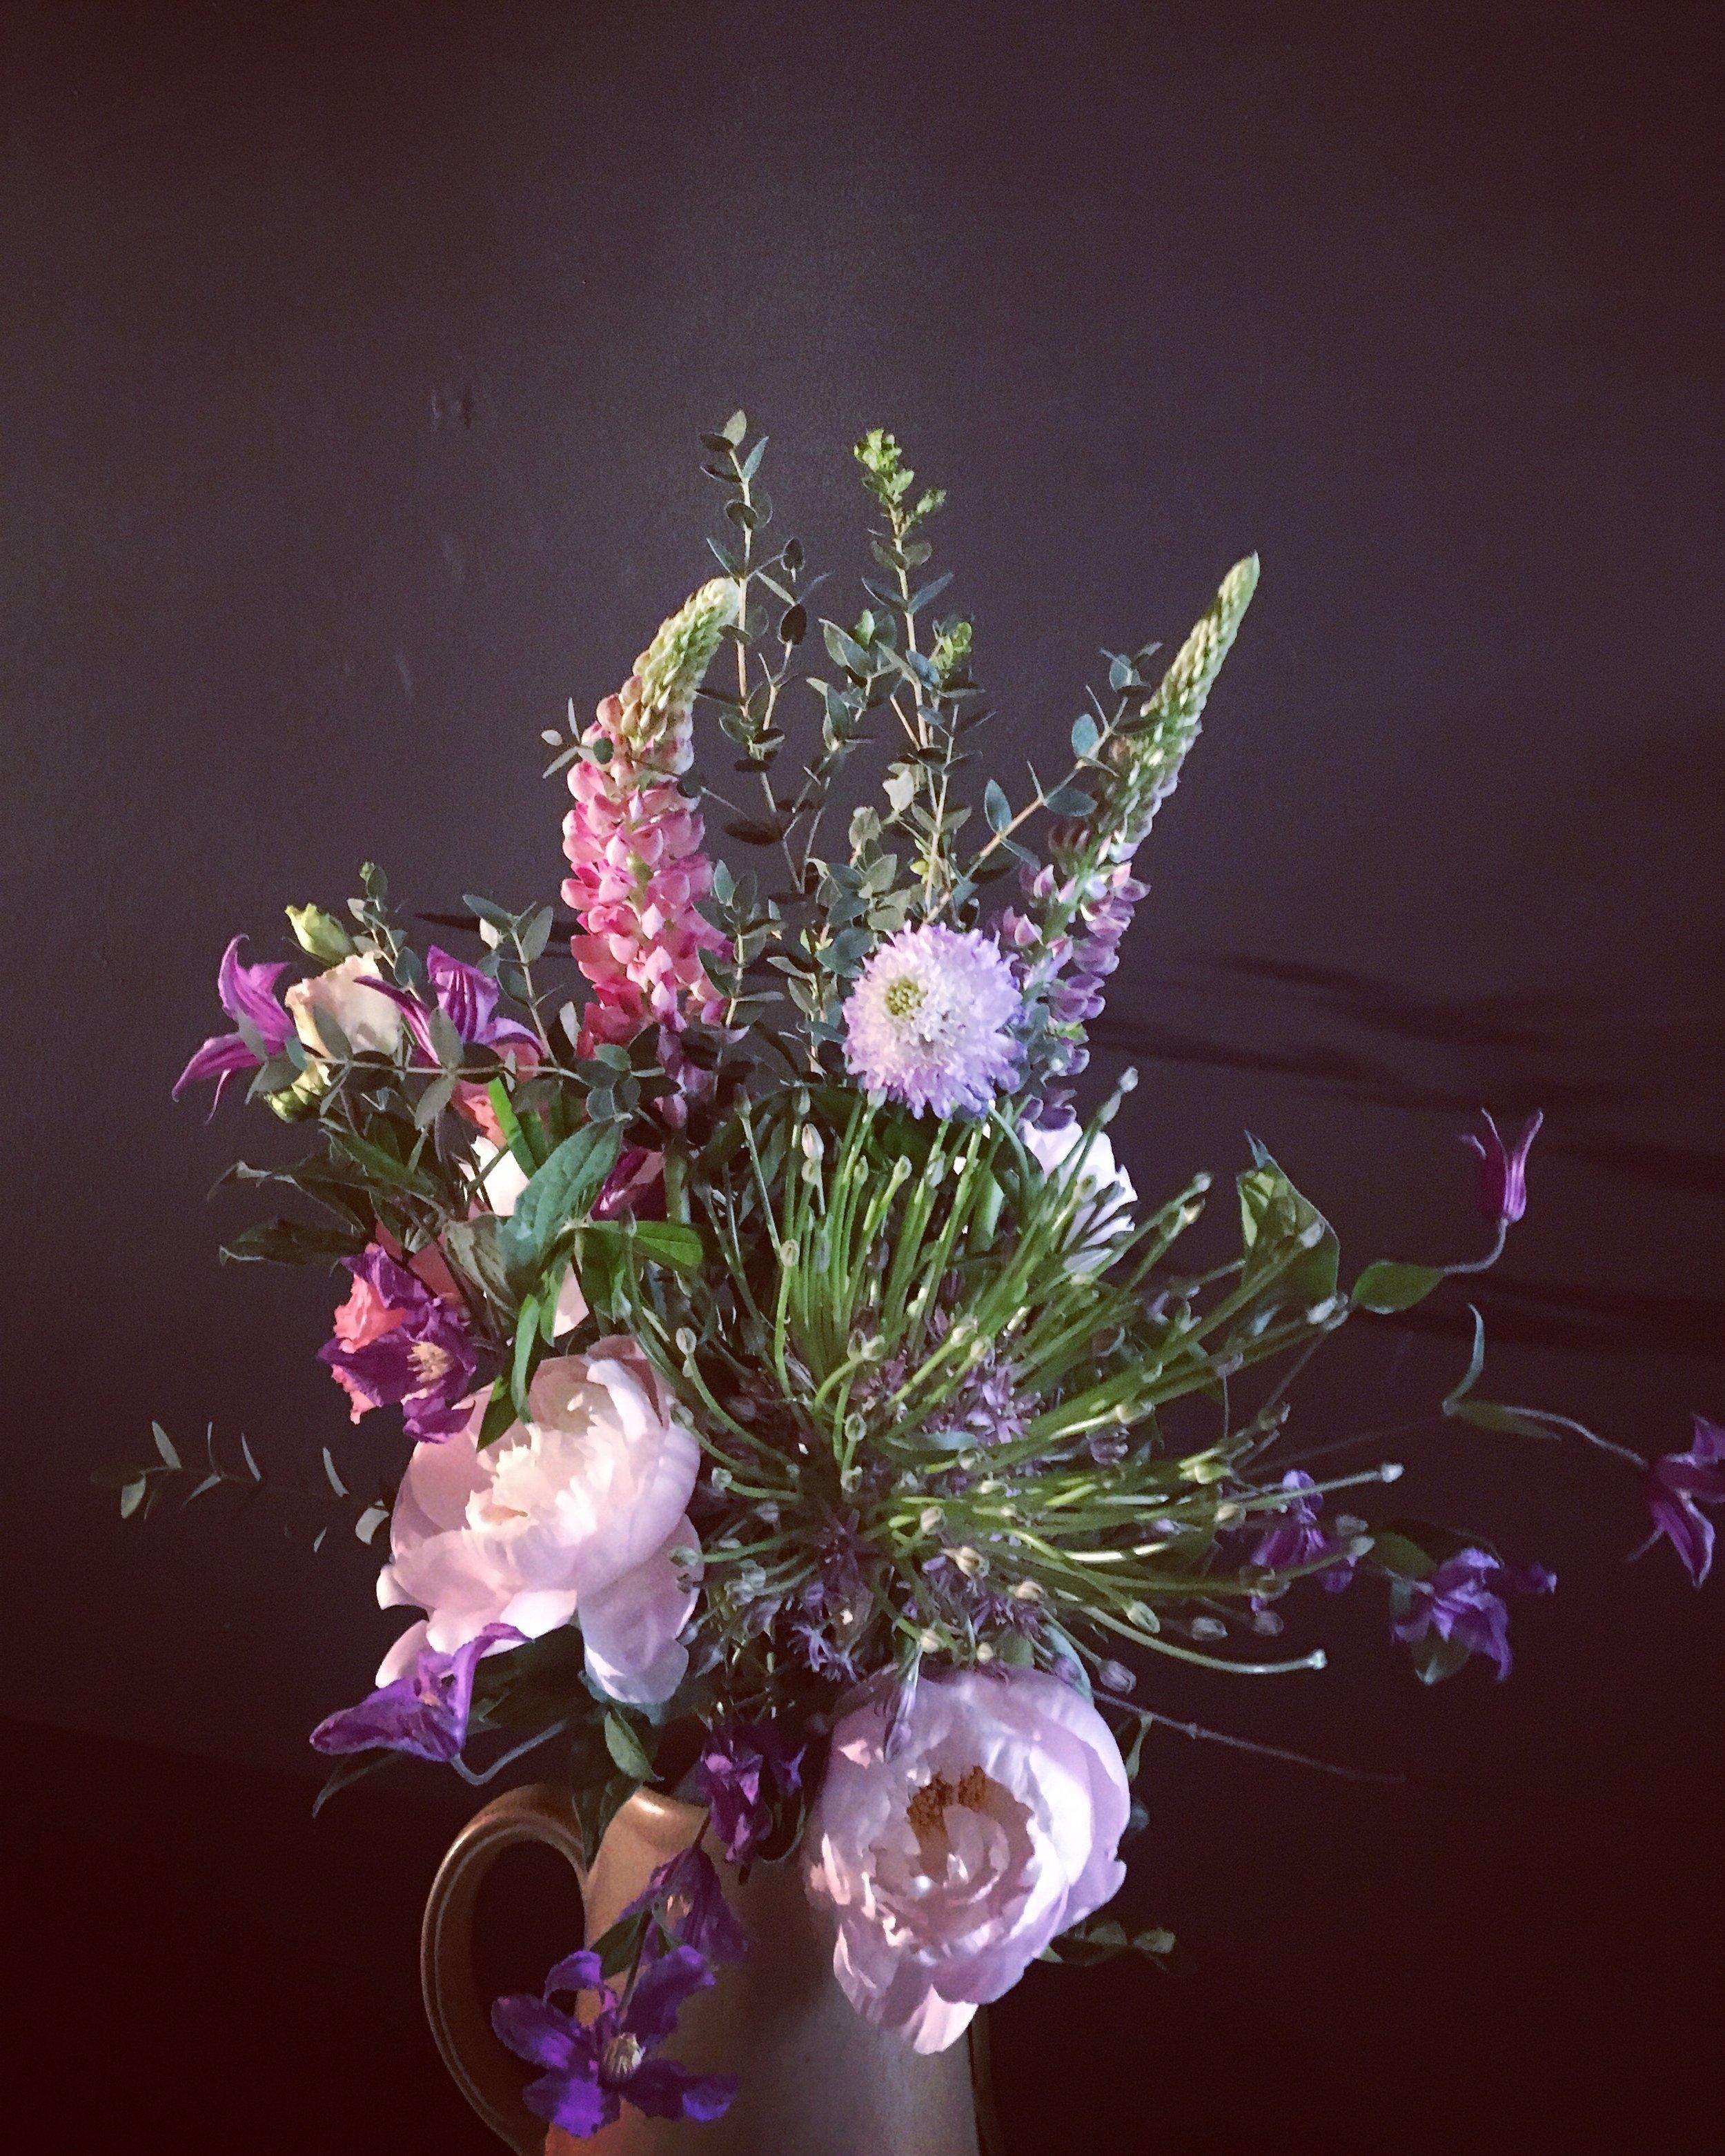 Bouquet by Horty Poetry - WEEK 21 - May 2019 - Le Poétique - Pivoines poudrées, Lupins, Scabieuses, Clématites, Alium Shubertti, Eucalyptus Parvifolia (…).